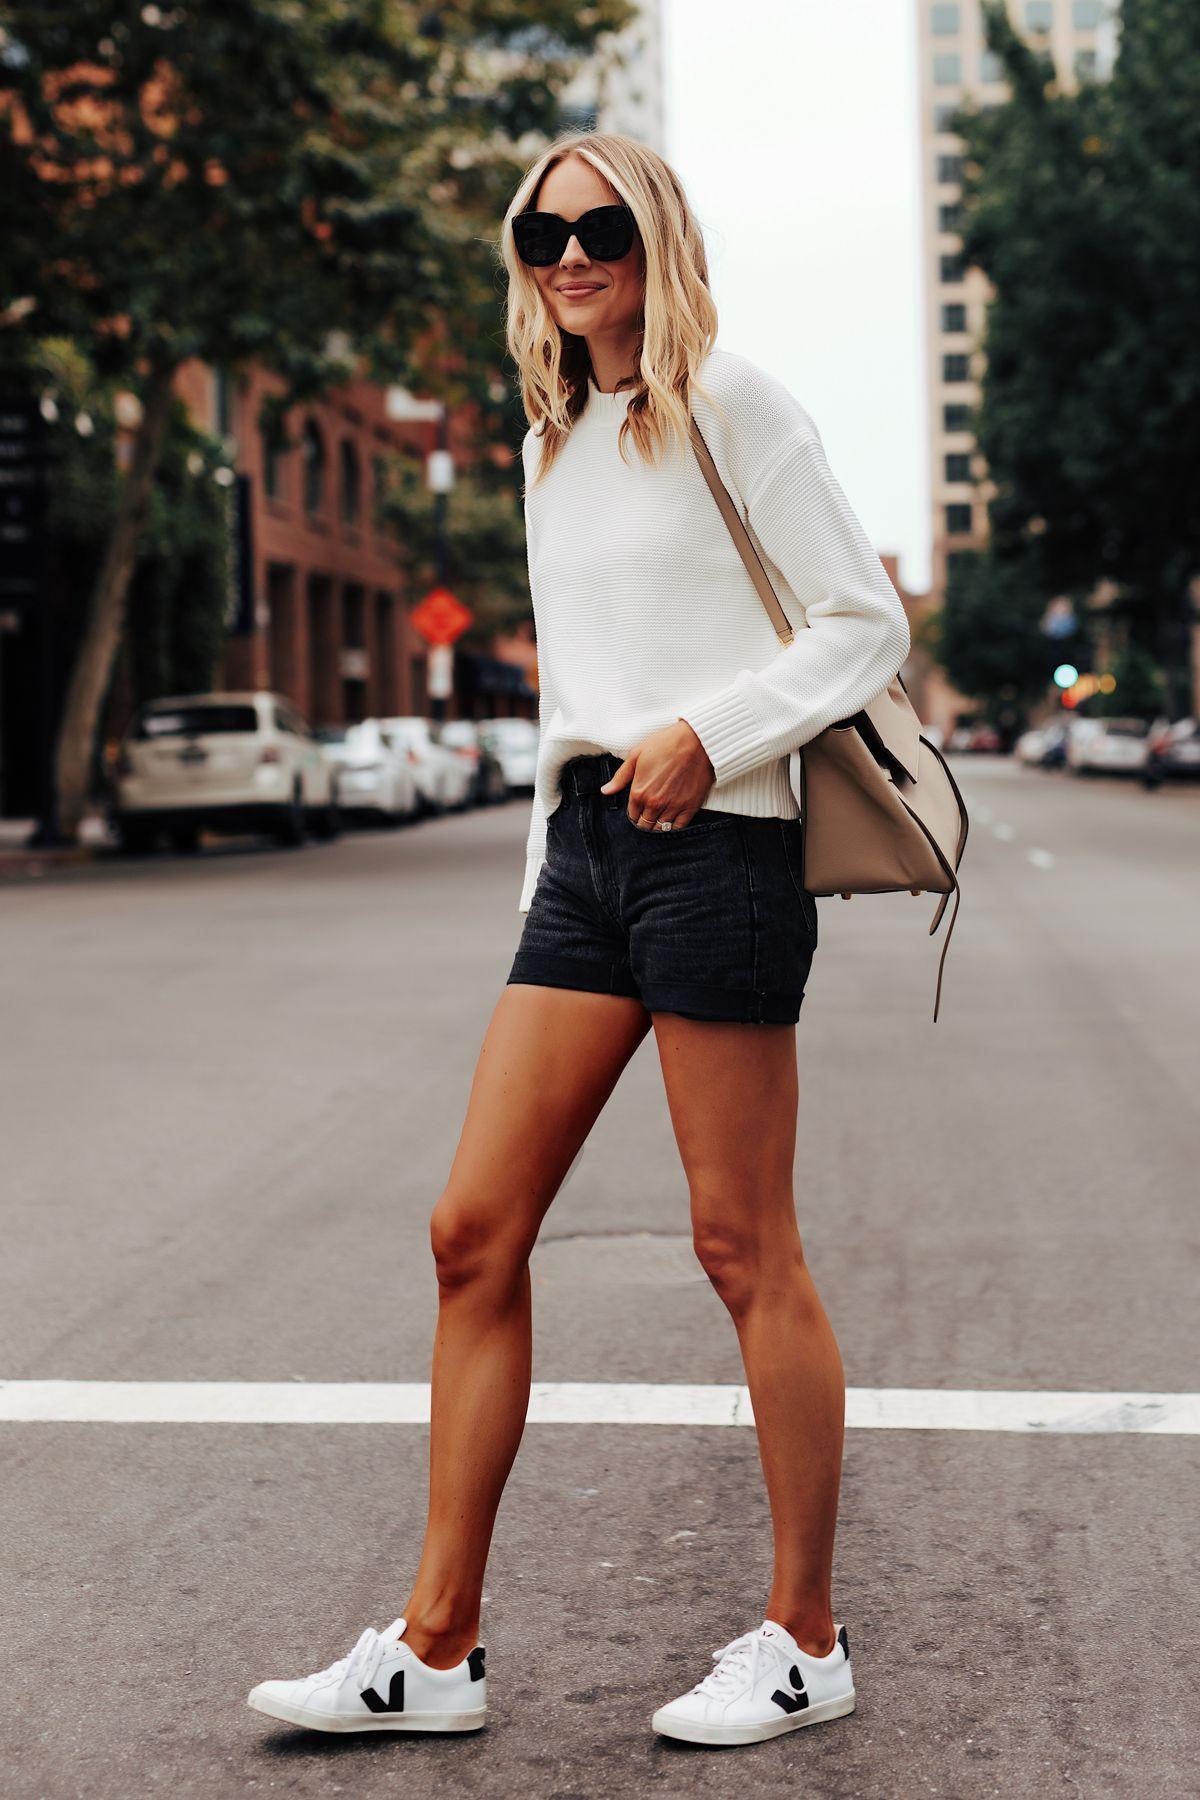 Fashion jackson, Sneaker outfits women